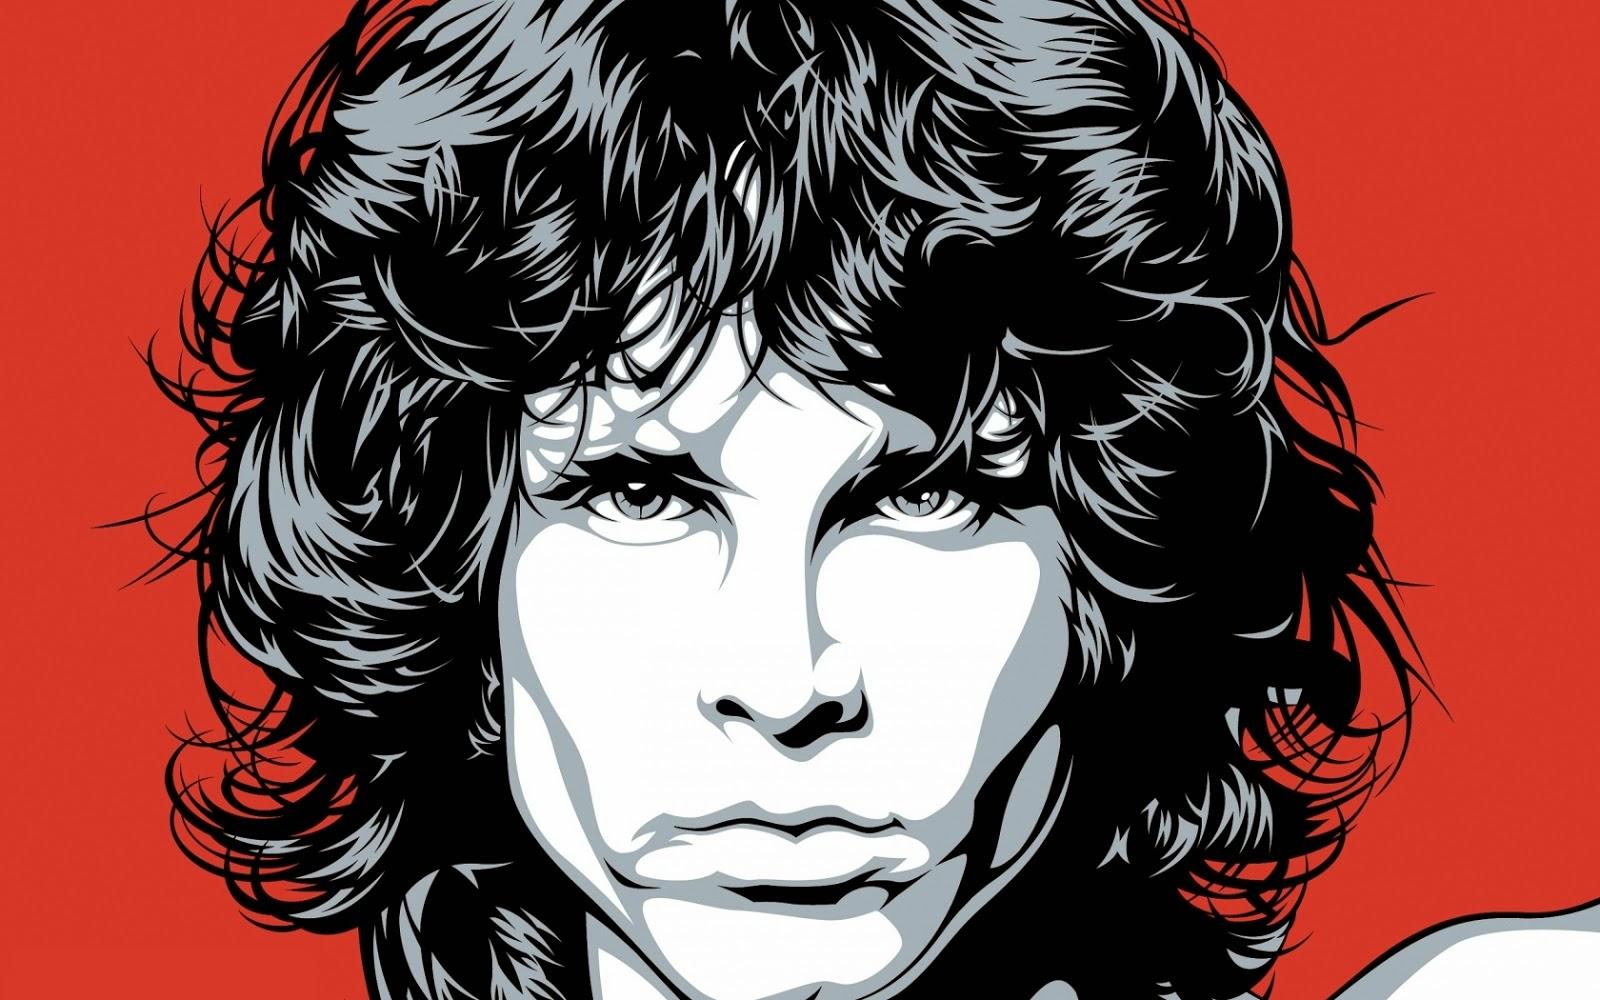 Wallpapers Hd 36 Wallpapers Music The Doors Jim Morrison Hd